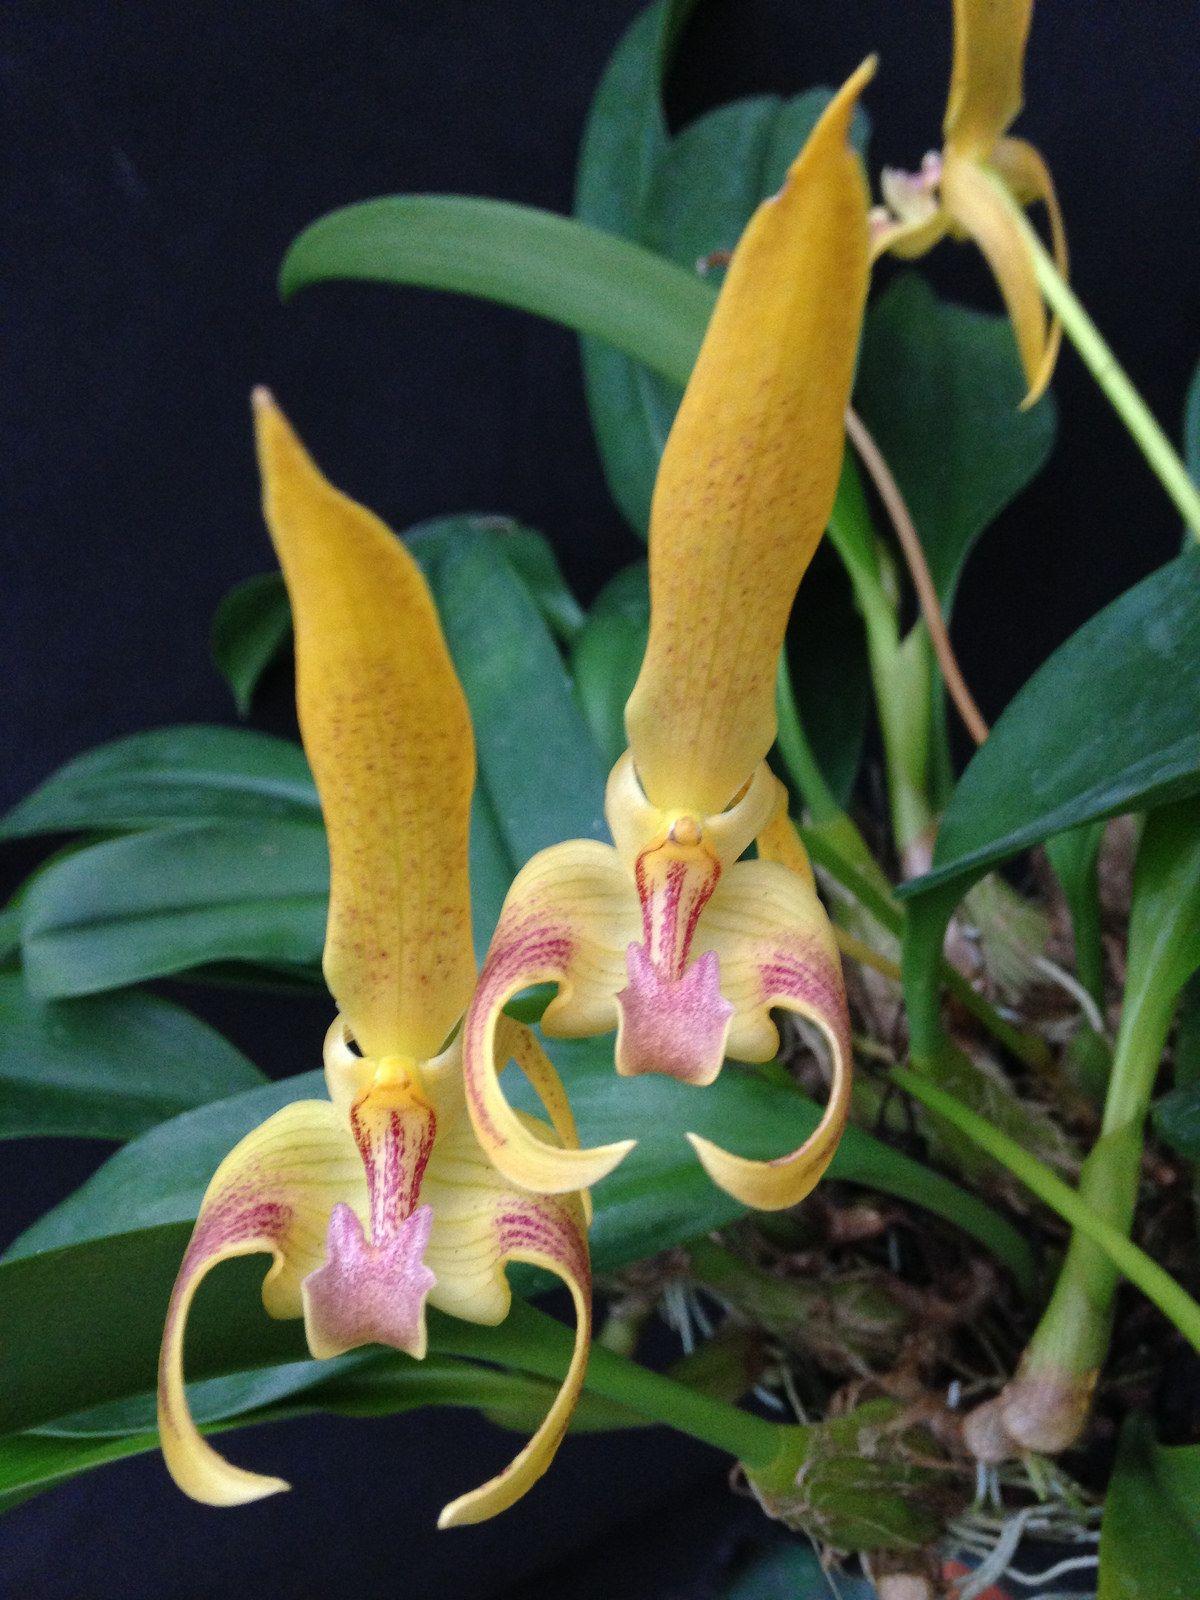 Bulbophyllum lobbii ukathyus goldu amaos scorpion orchid and flower